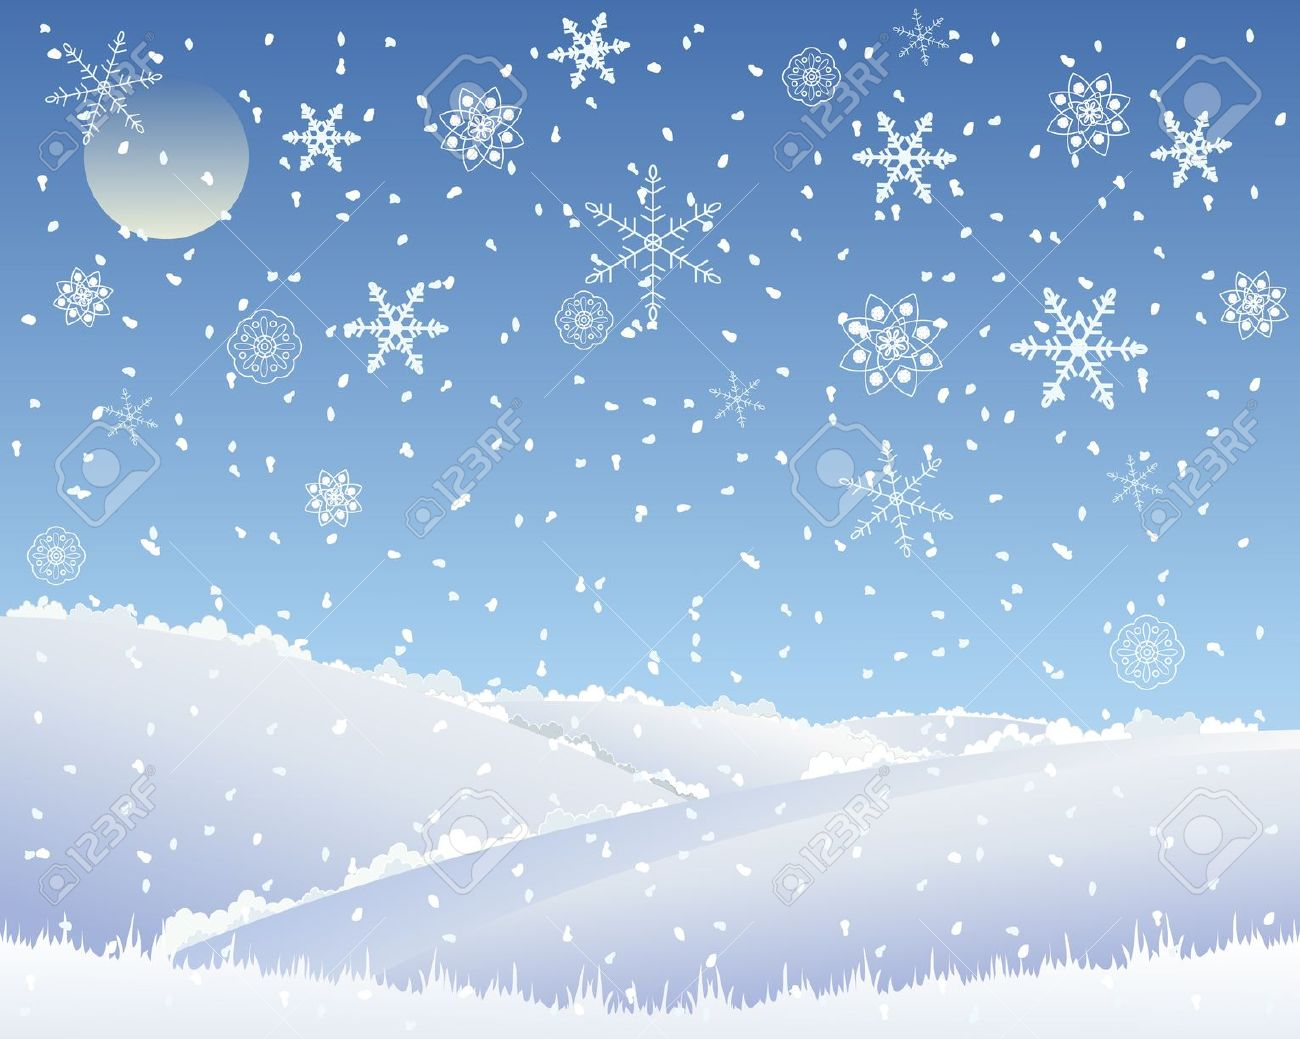 Snowfall clipart - Clipground